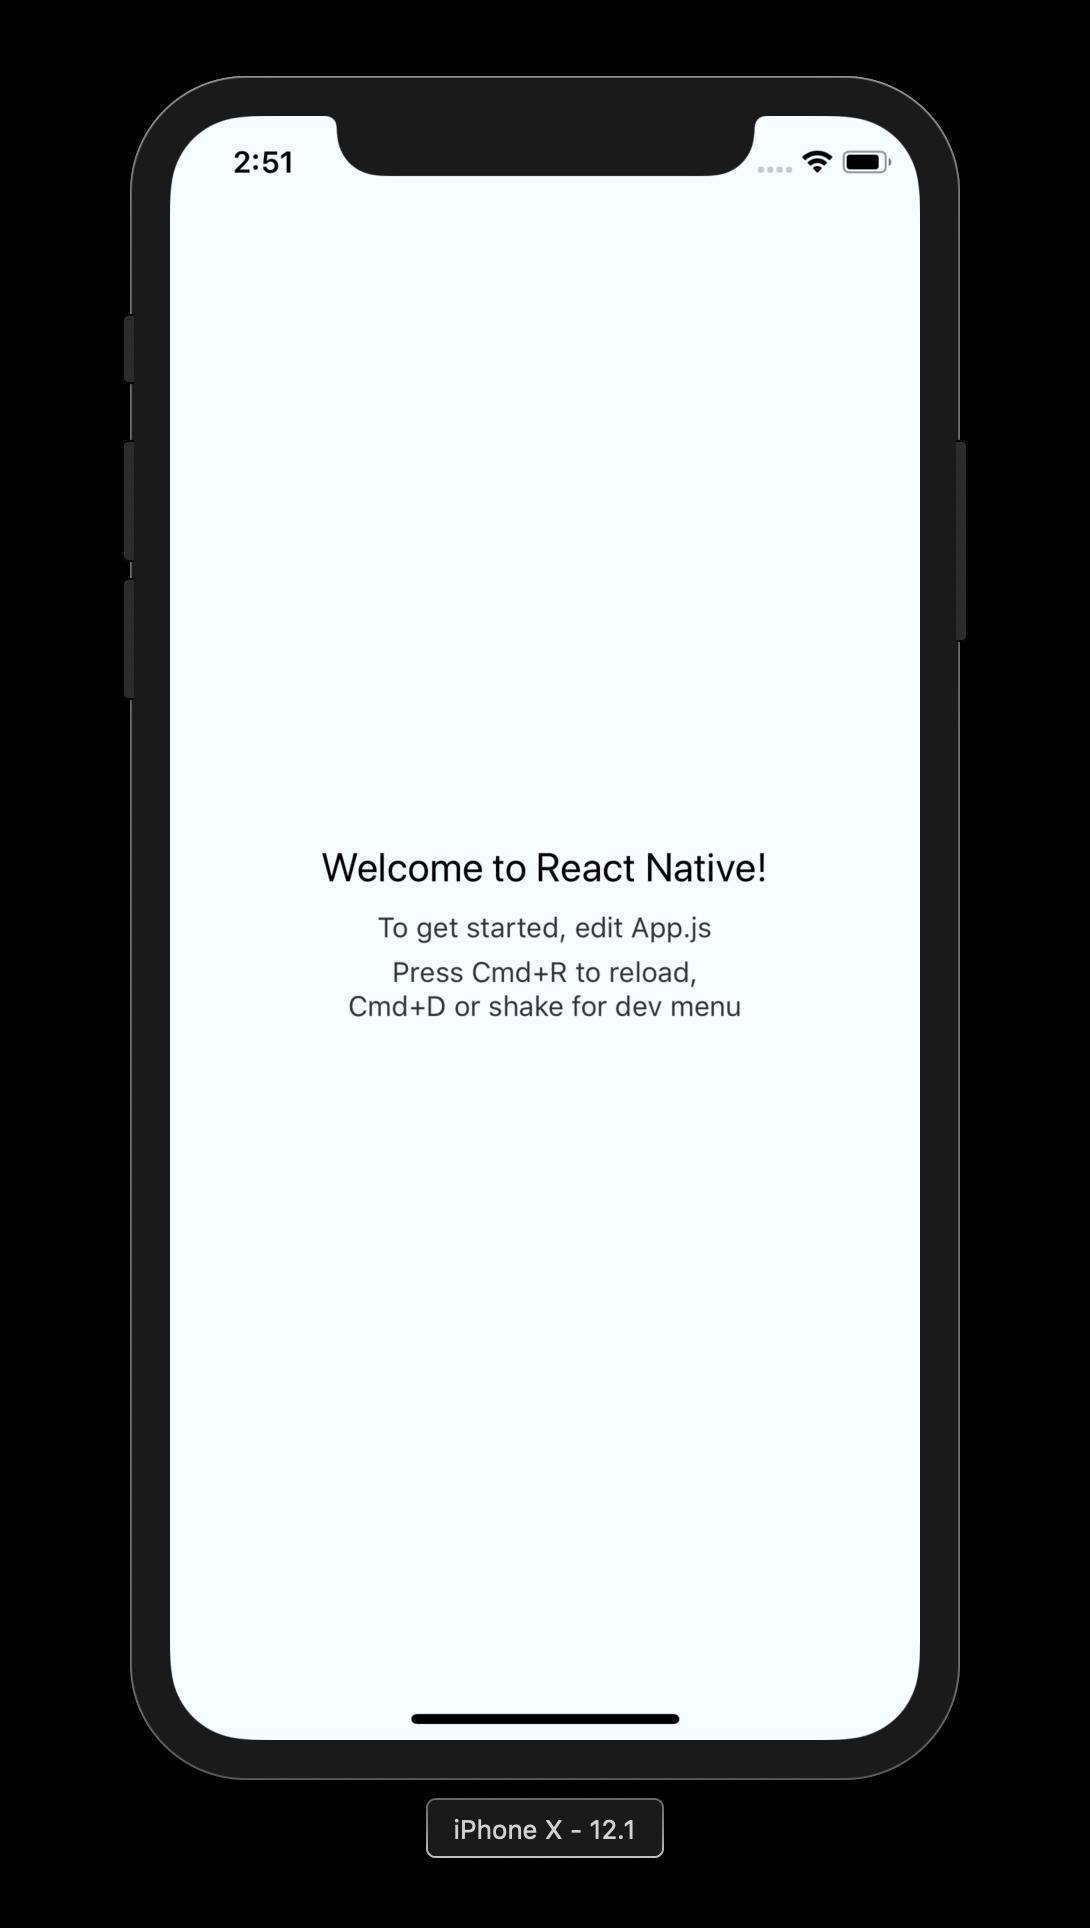 react native on iphone simulator